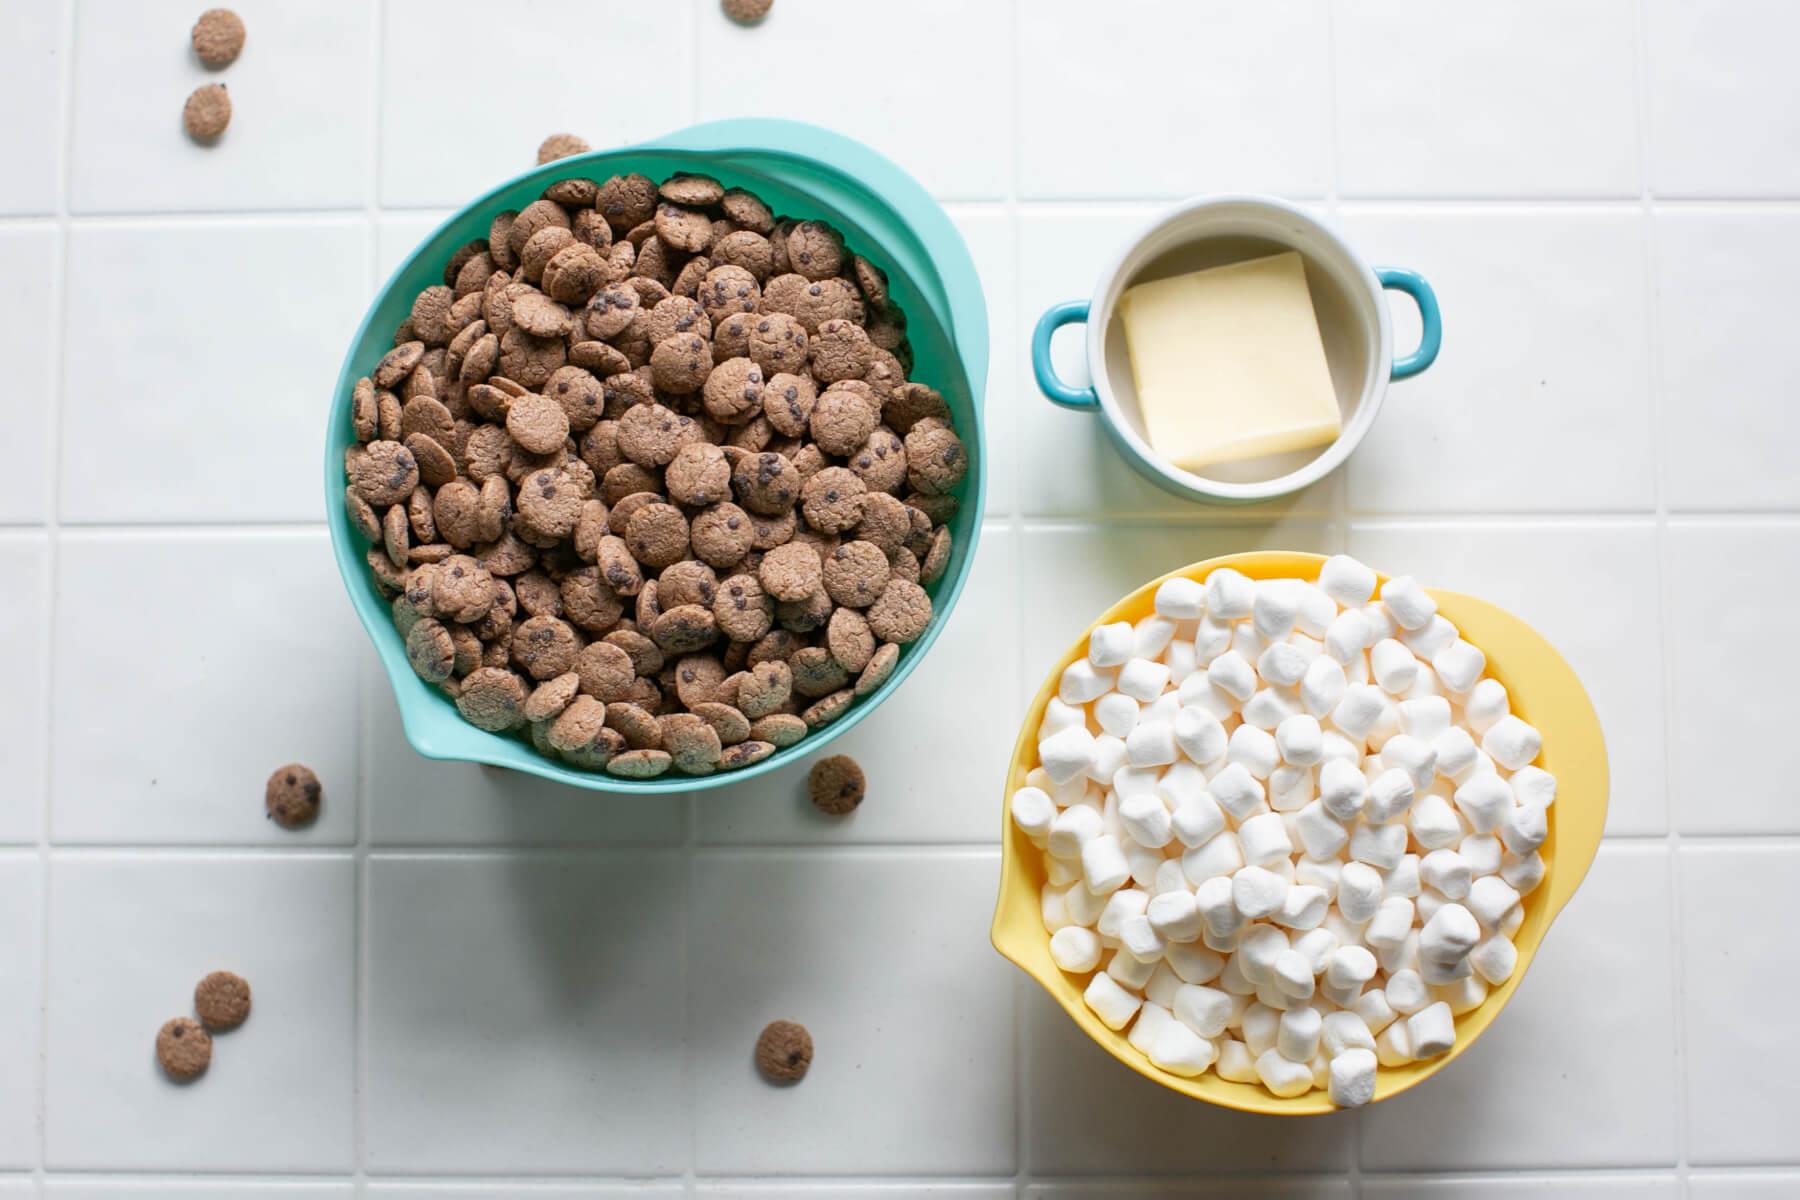 ingredients to make cookie crisp marshmallow treats